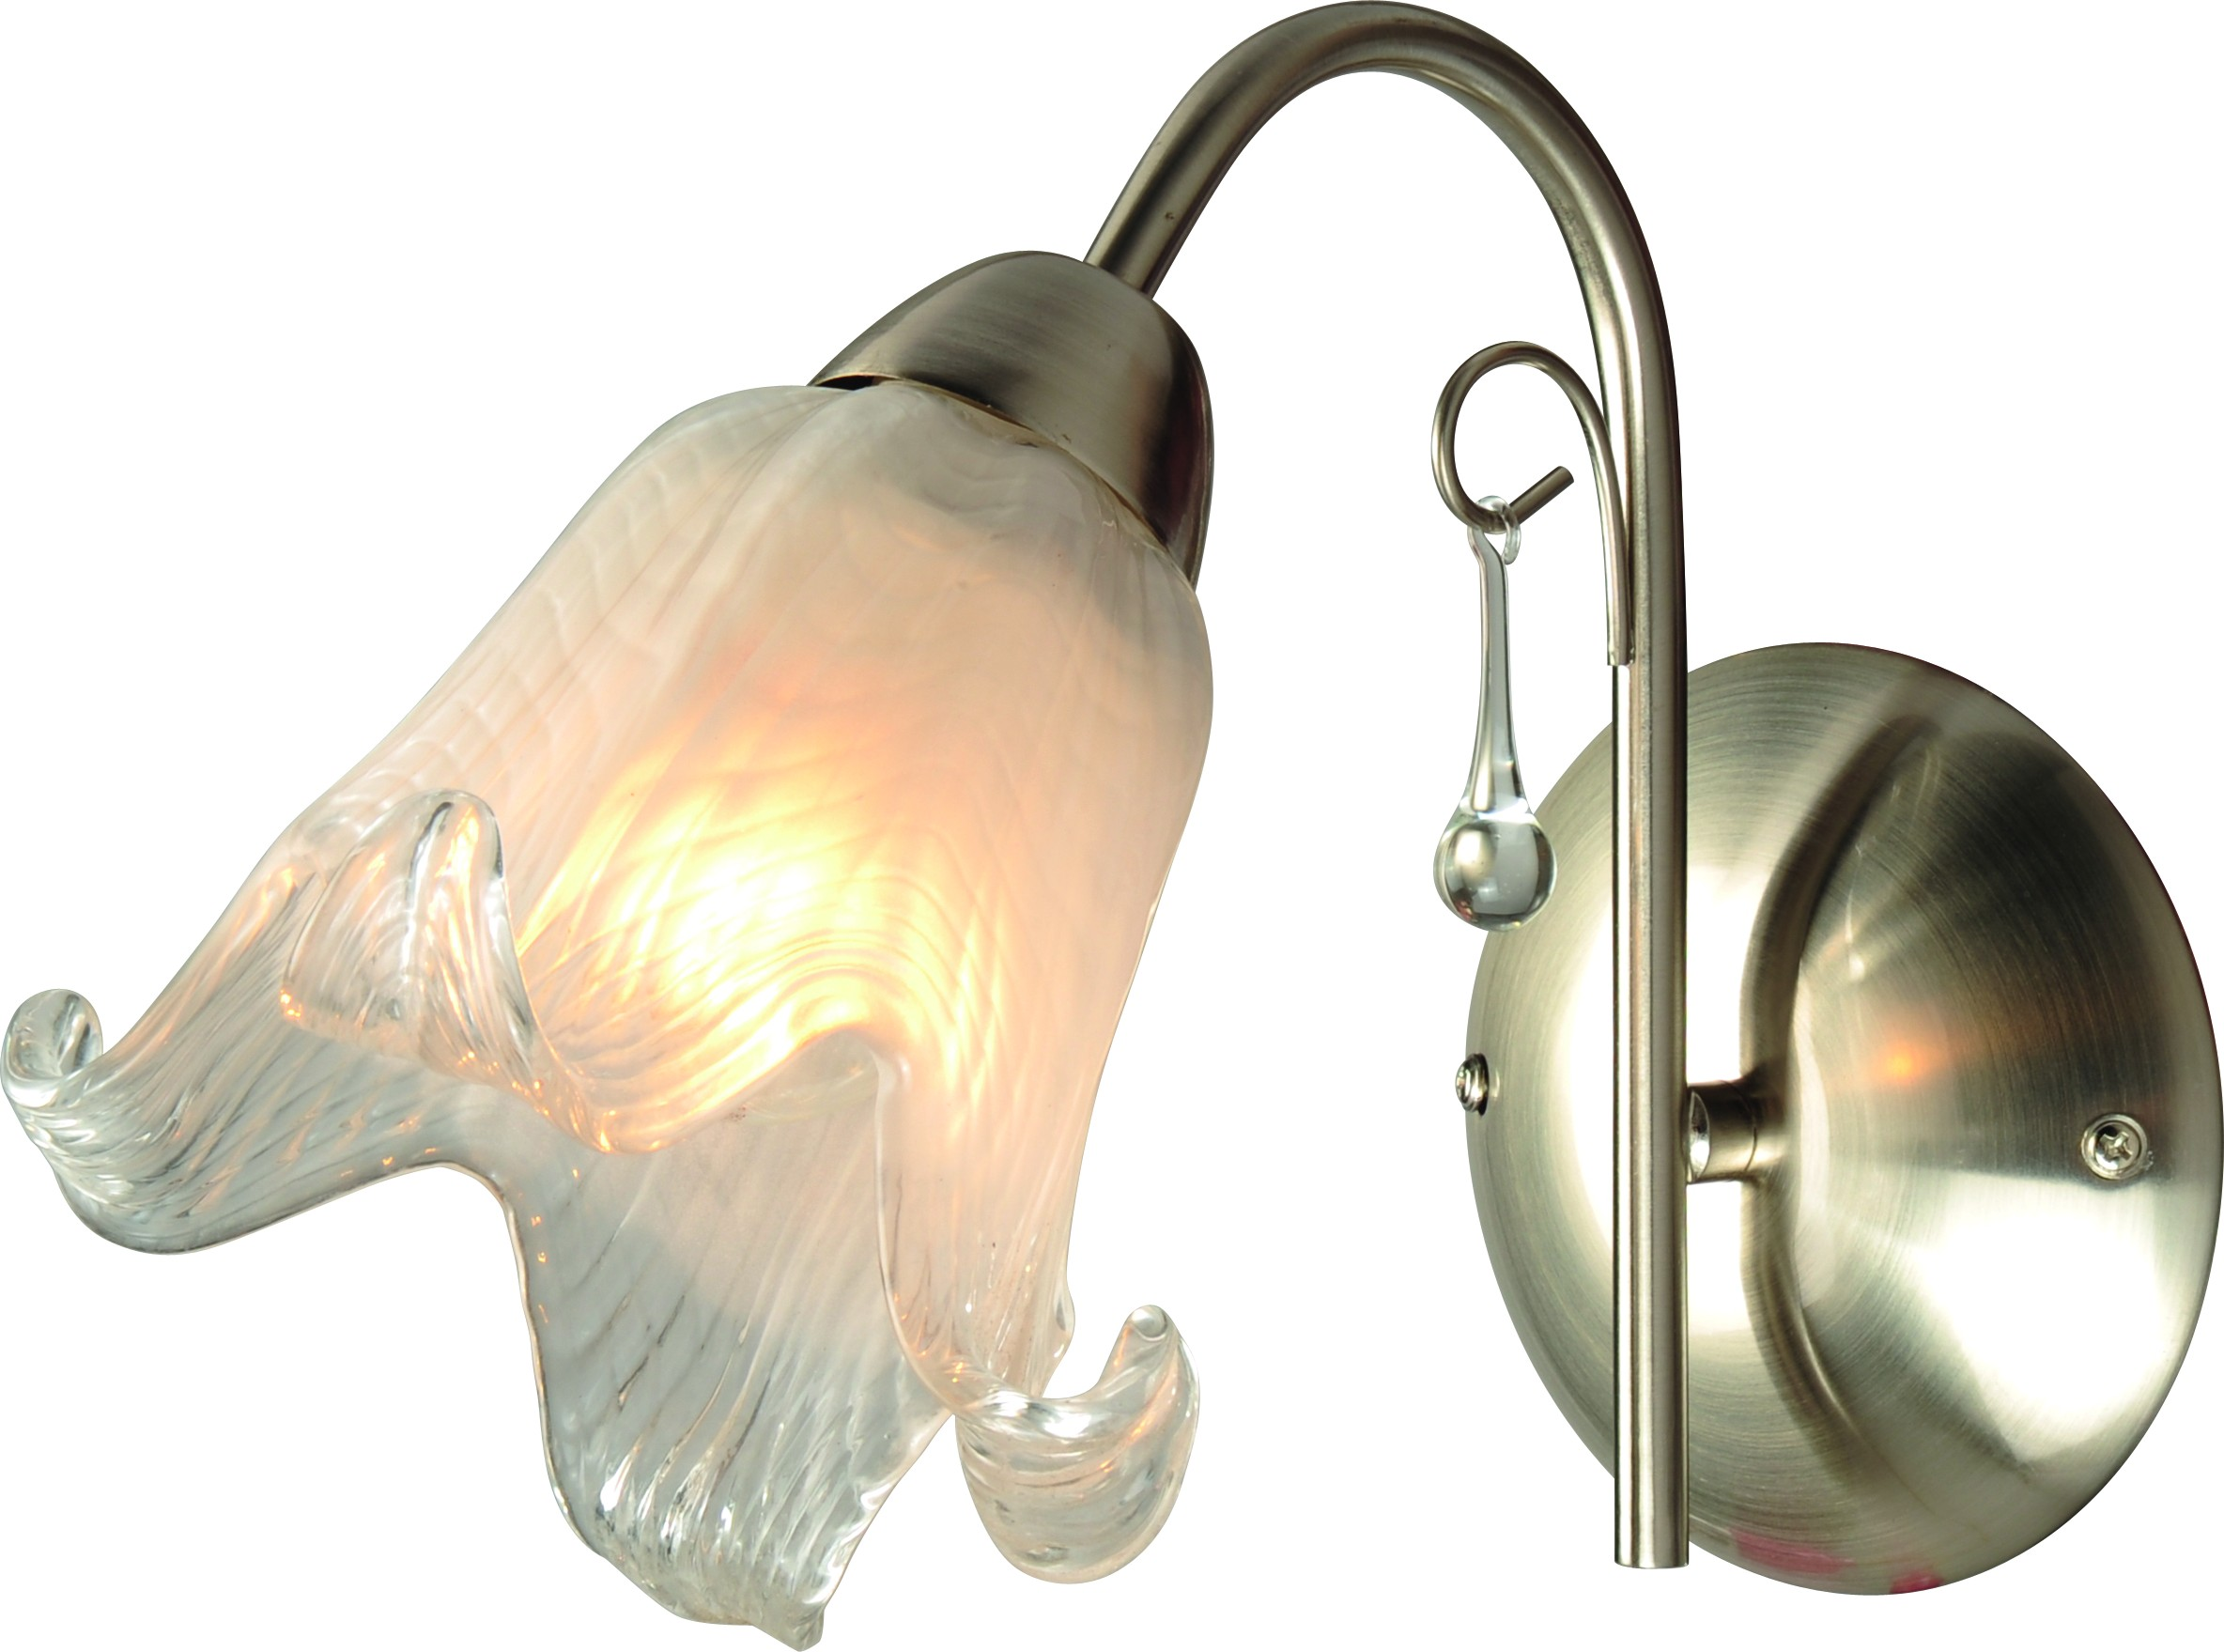 Бра Arte lamp A7957ap-1ss arte lamp бра arte lamp 78 a7957ap 1ss